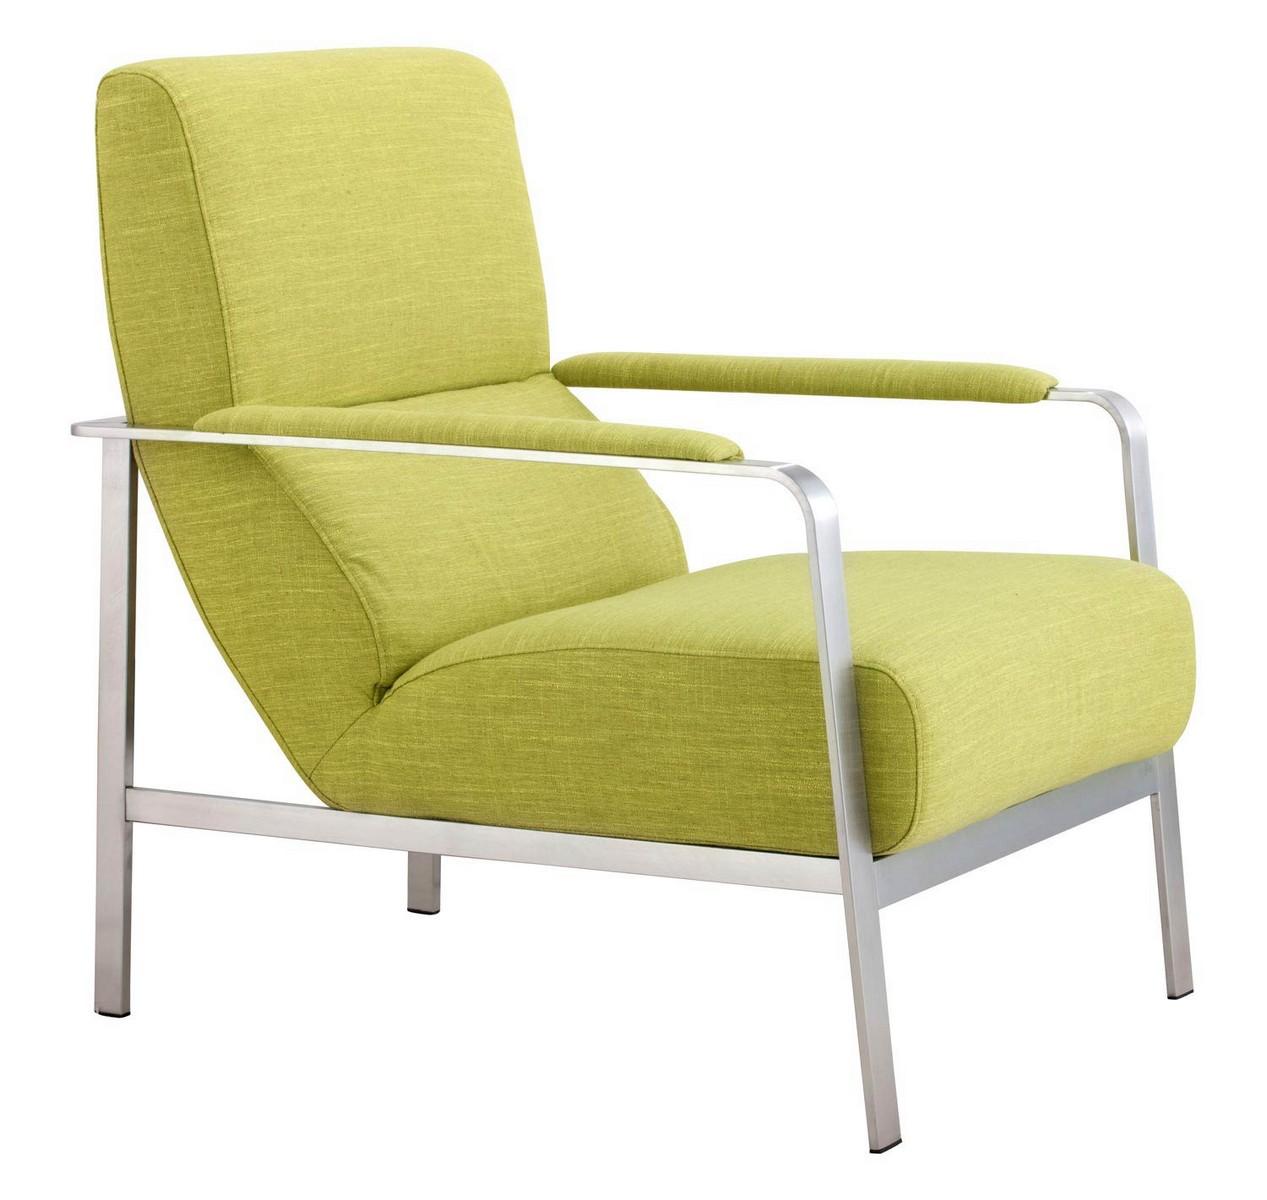 Zuo Modern Jonkoping Arm Chair - Lime